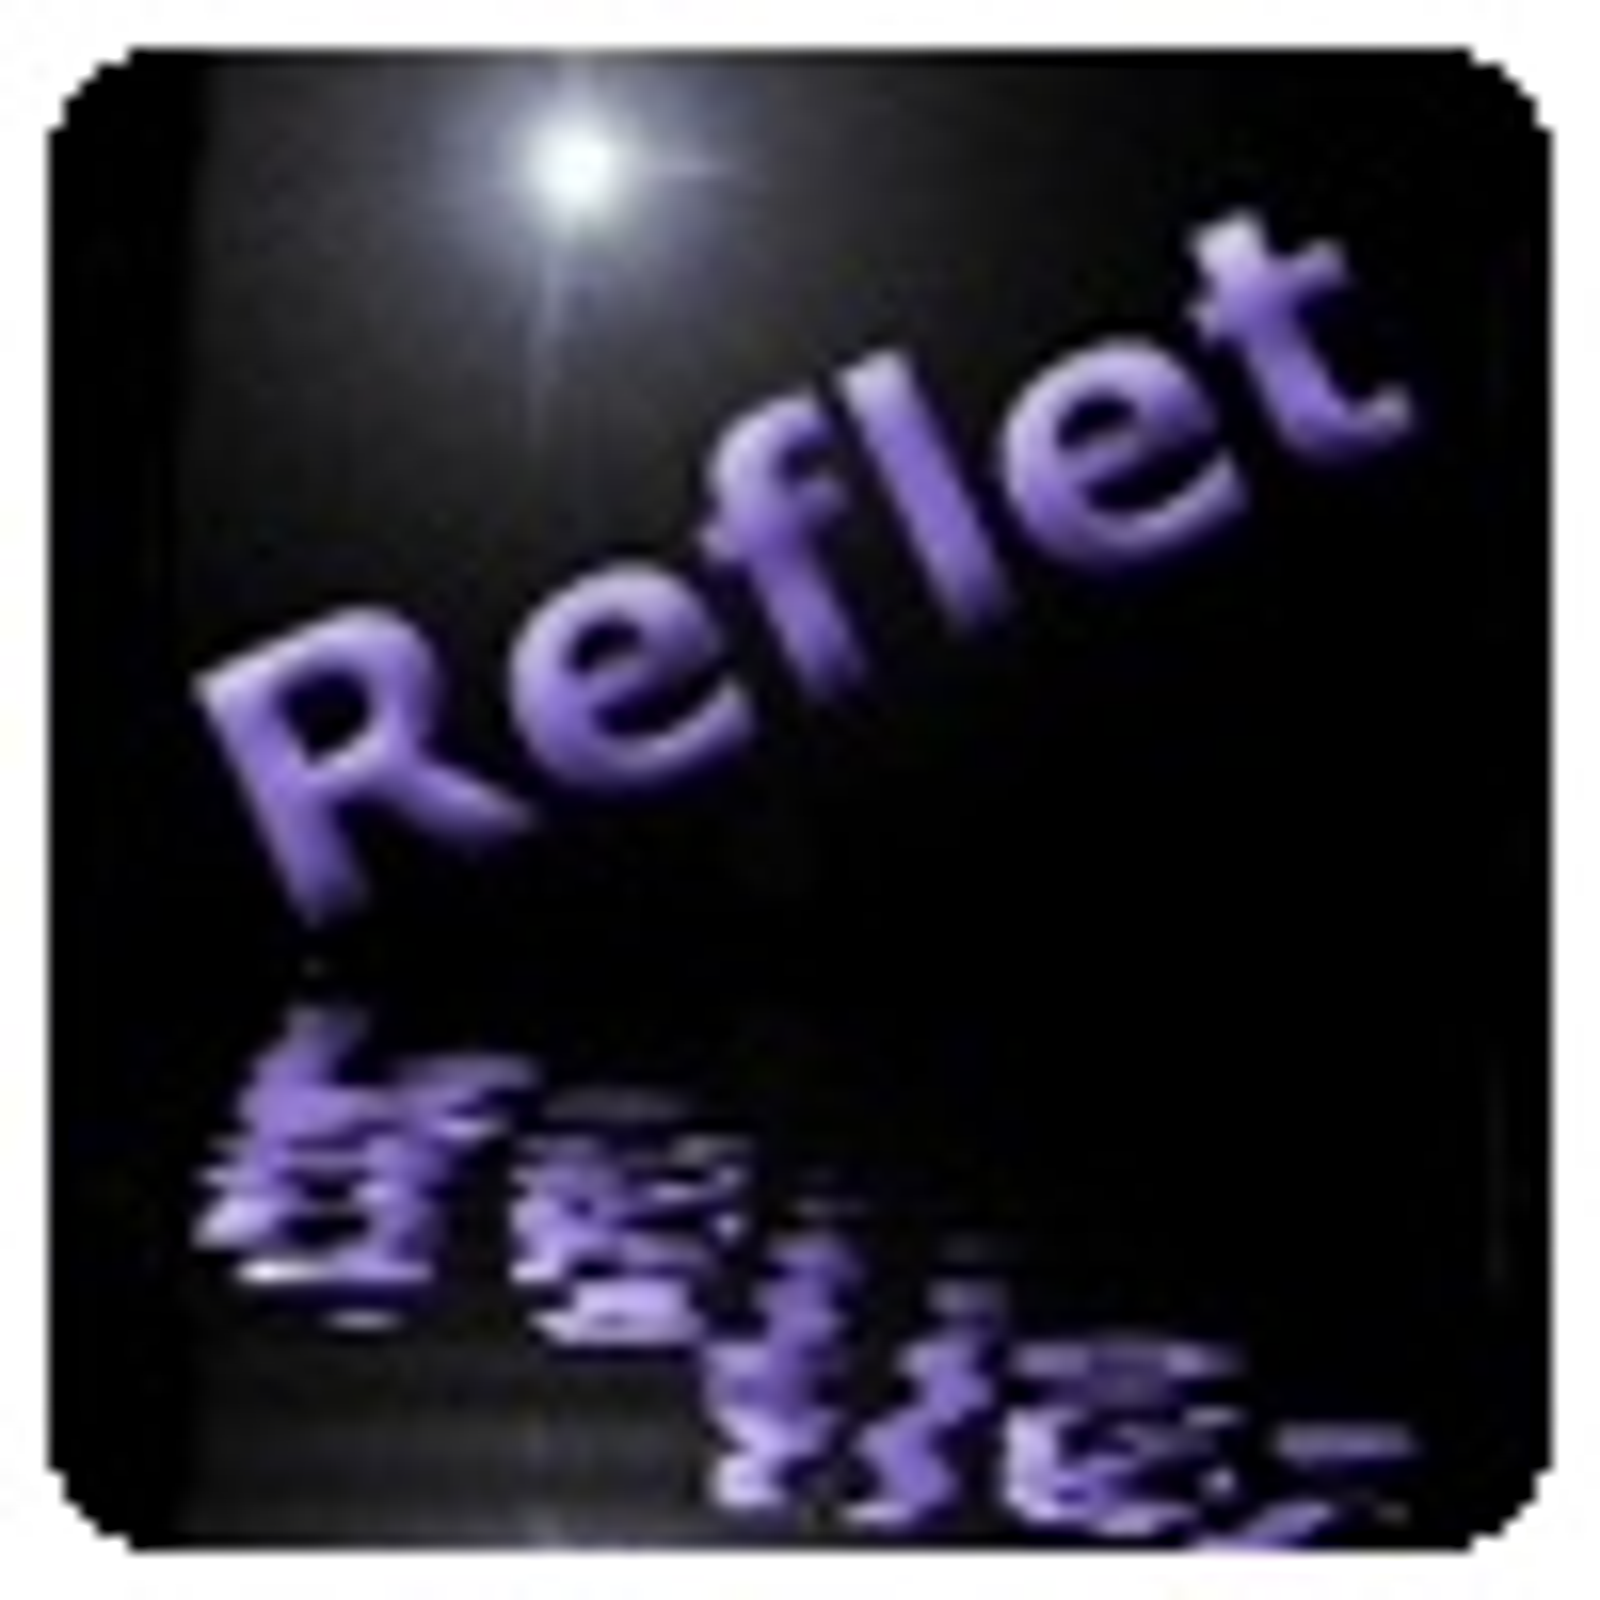 Reflet 2.6